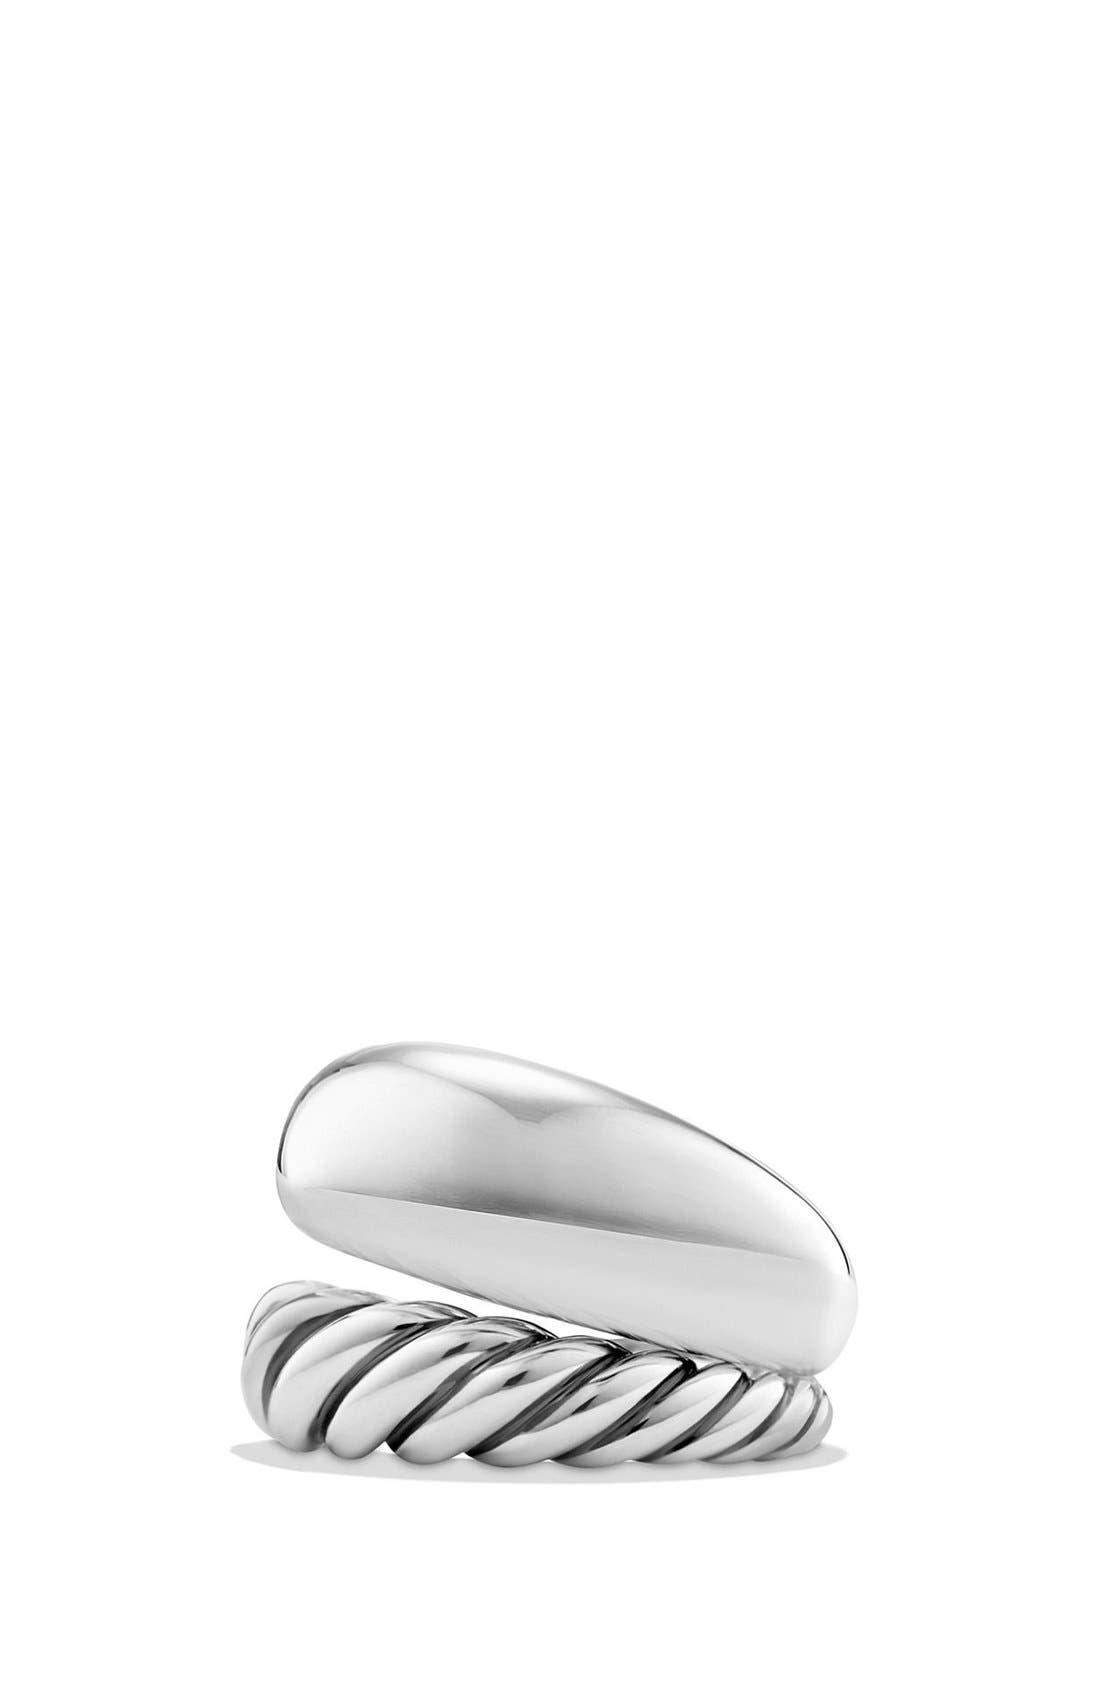 David Yurman 'Pure Form' Two Row Ring